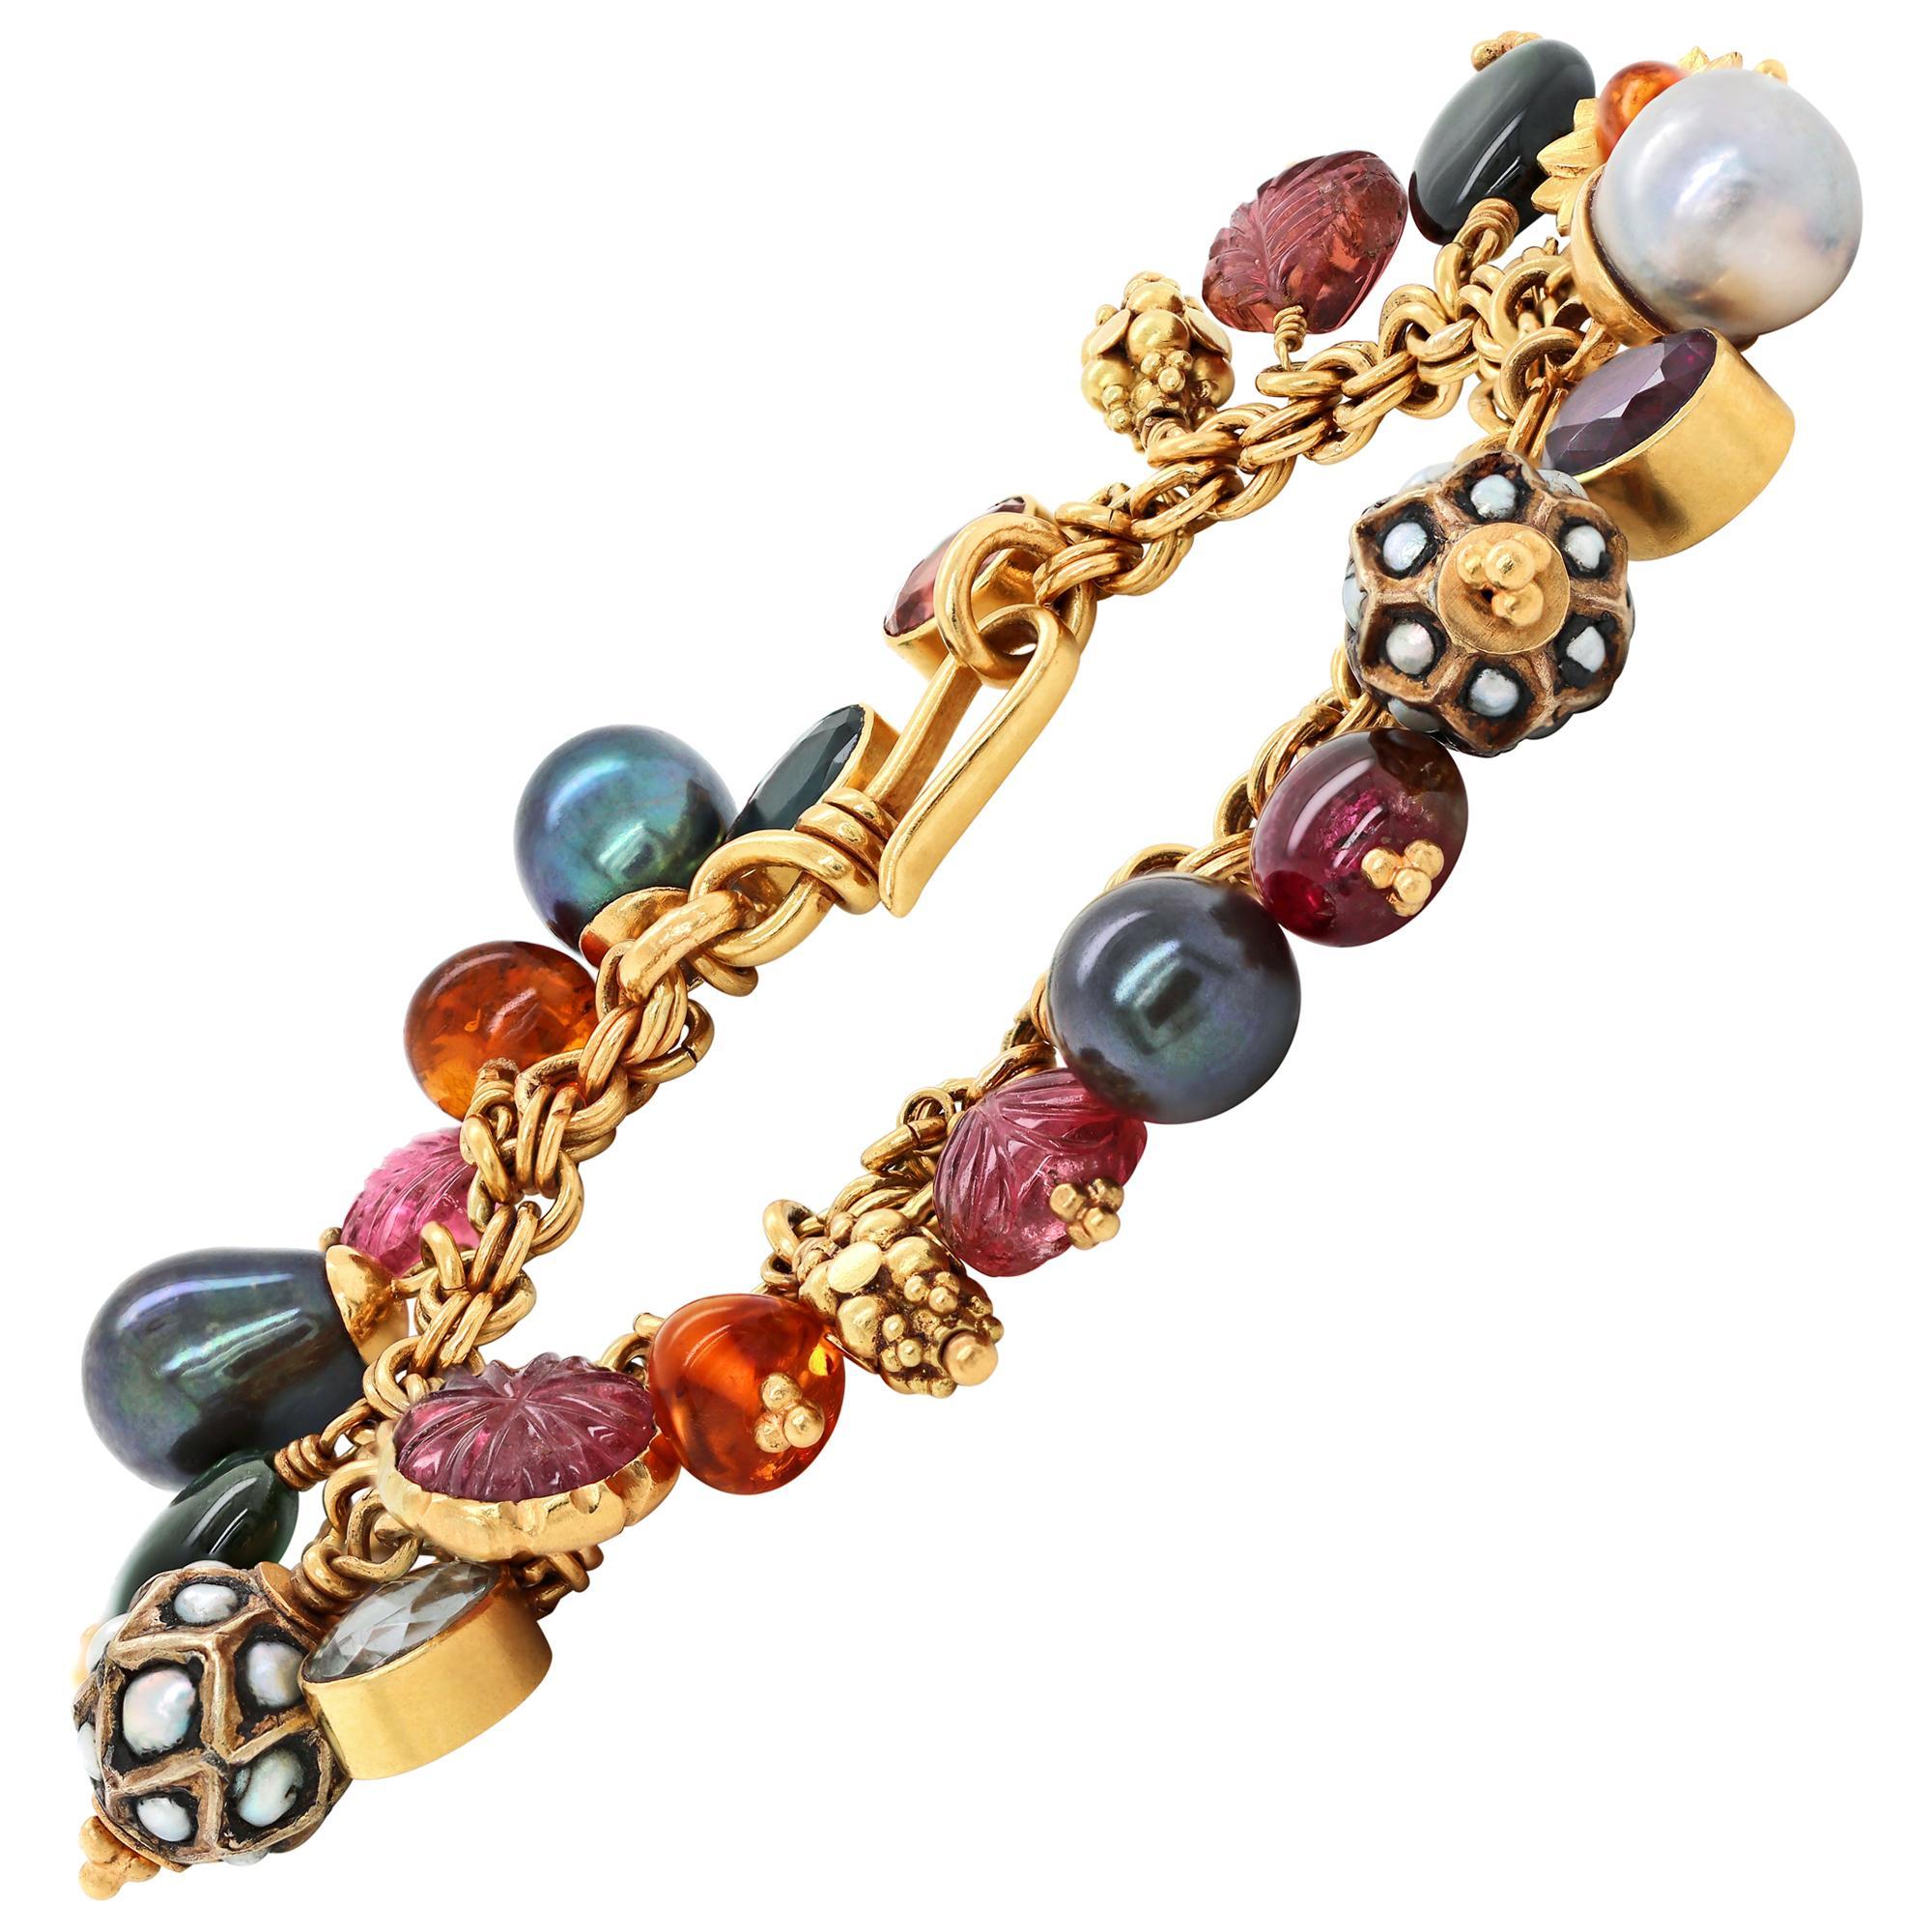 21 Carat Yellow Gold Multi-Gemstone Charm Bracelet